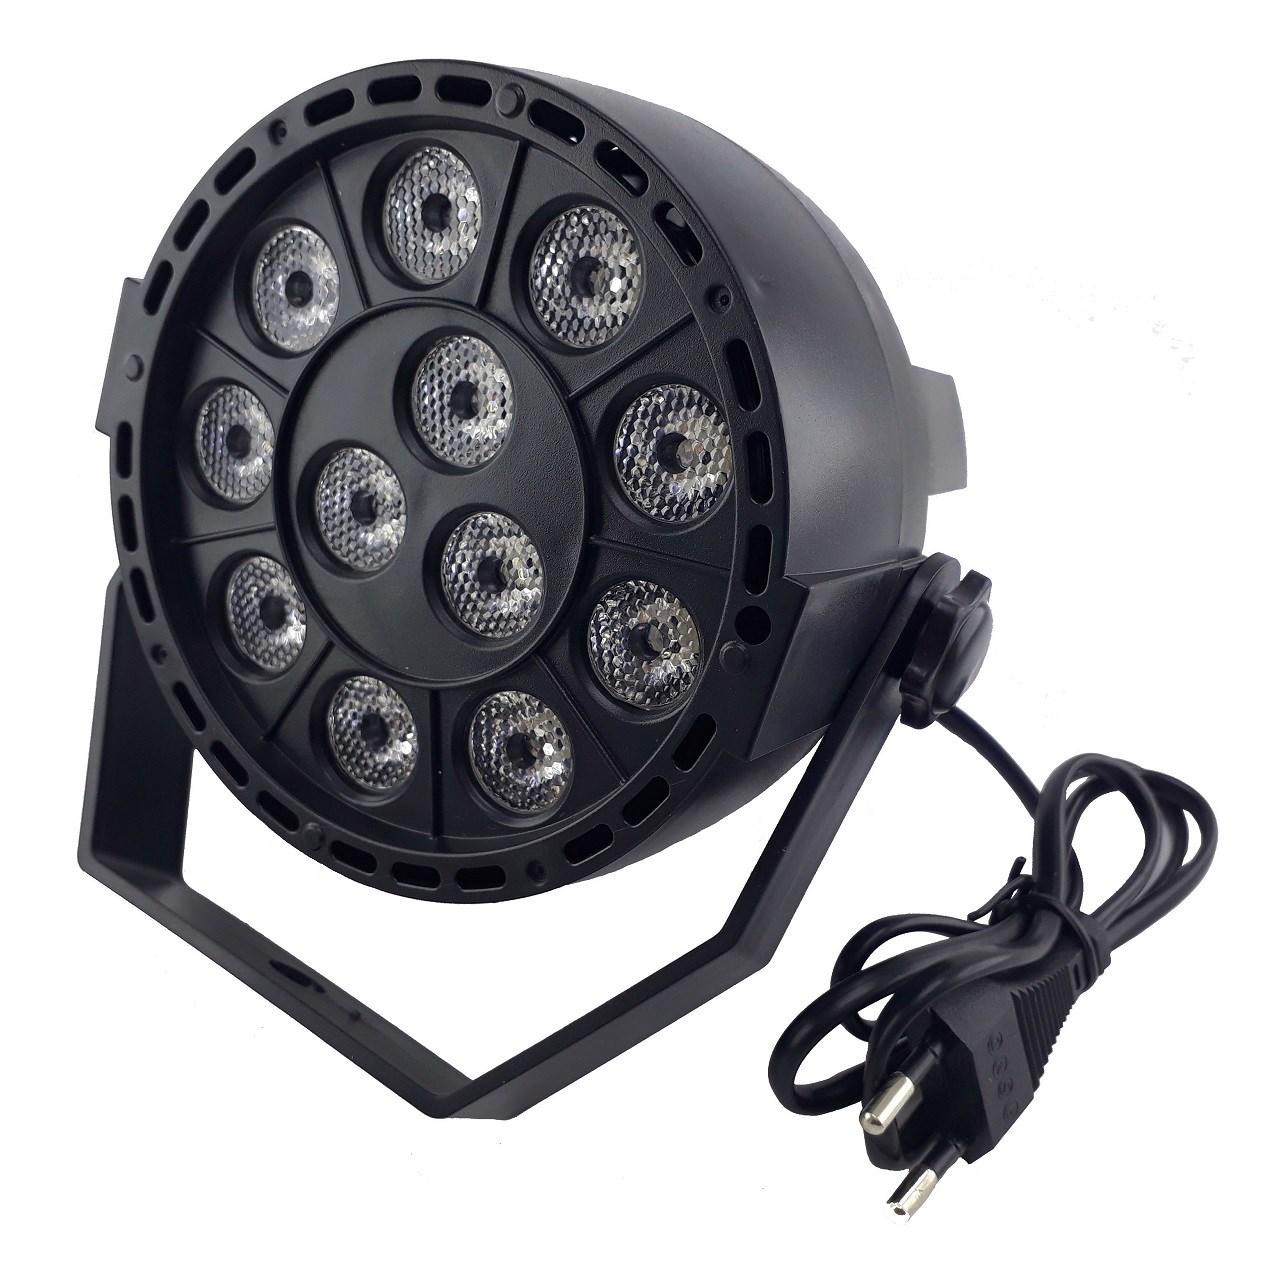 رقص نور پار مدل LED Mini Par Light